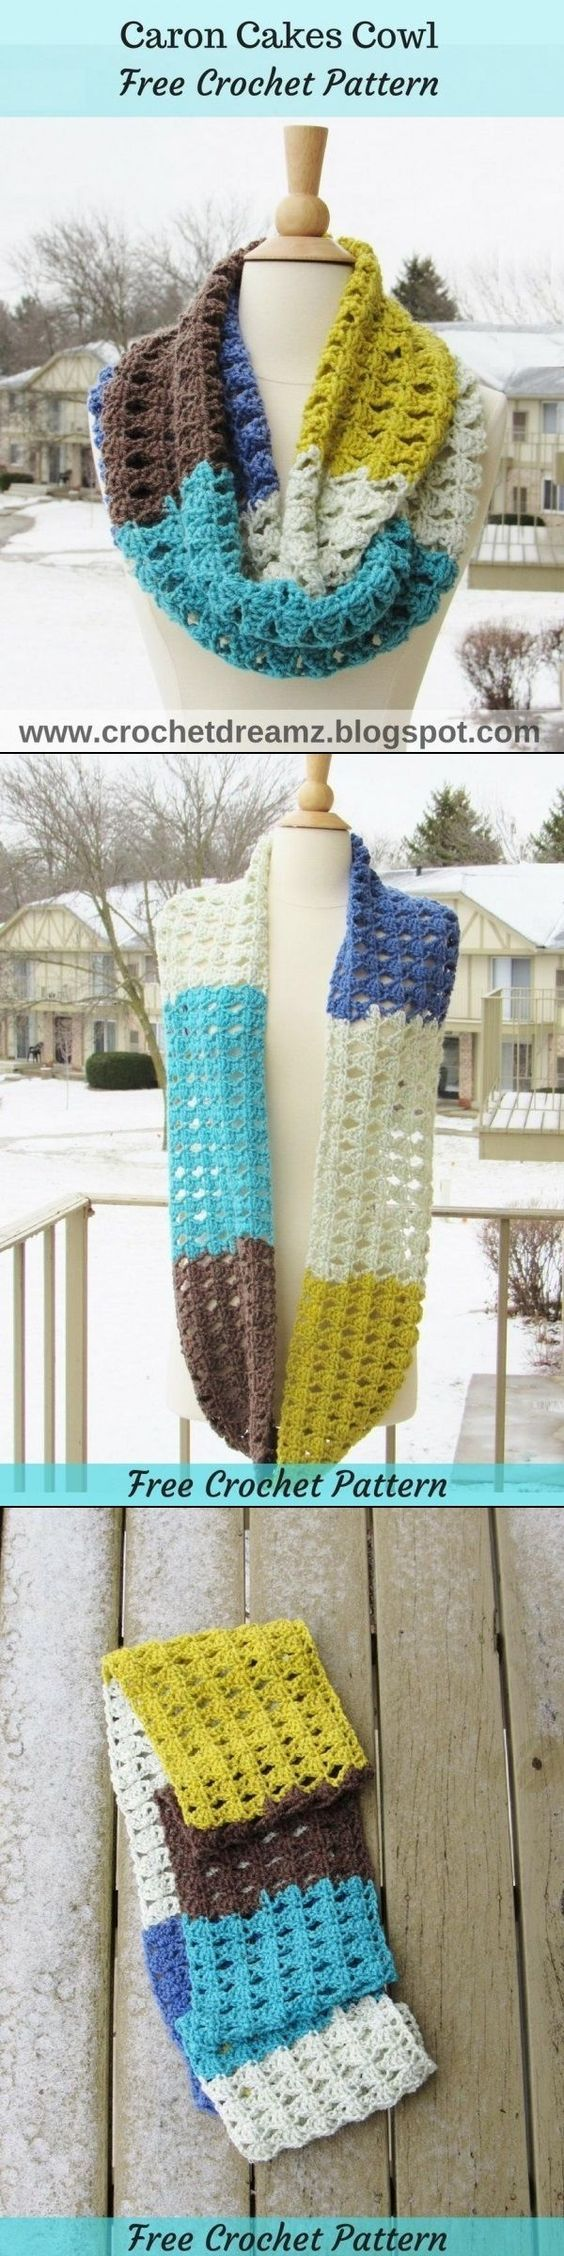 Caron Cakes Infinity Scarf Crochet Pattern, Kaleidoscope Infinity ...